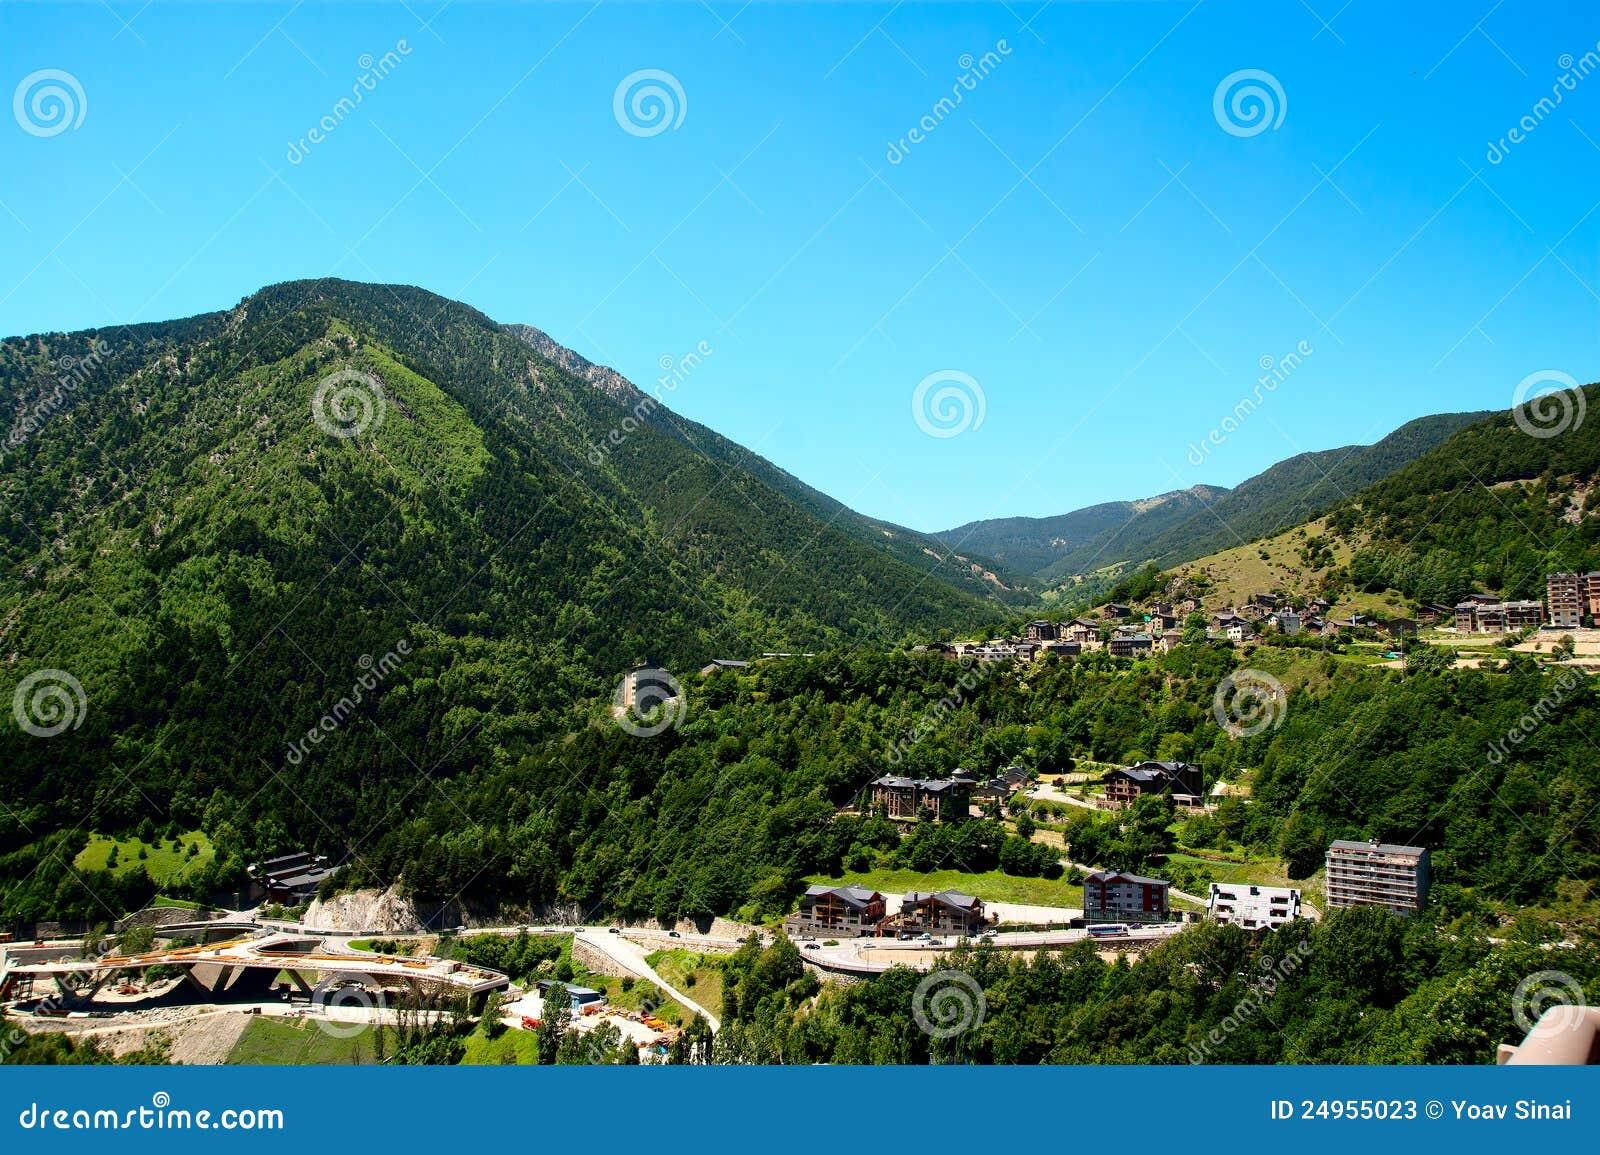 Landscape of Andorra Pyrenees